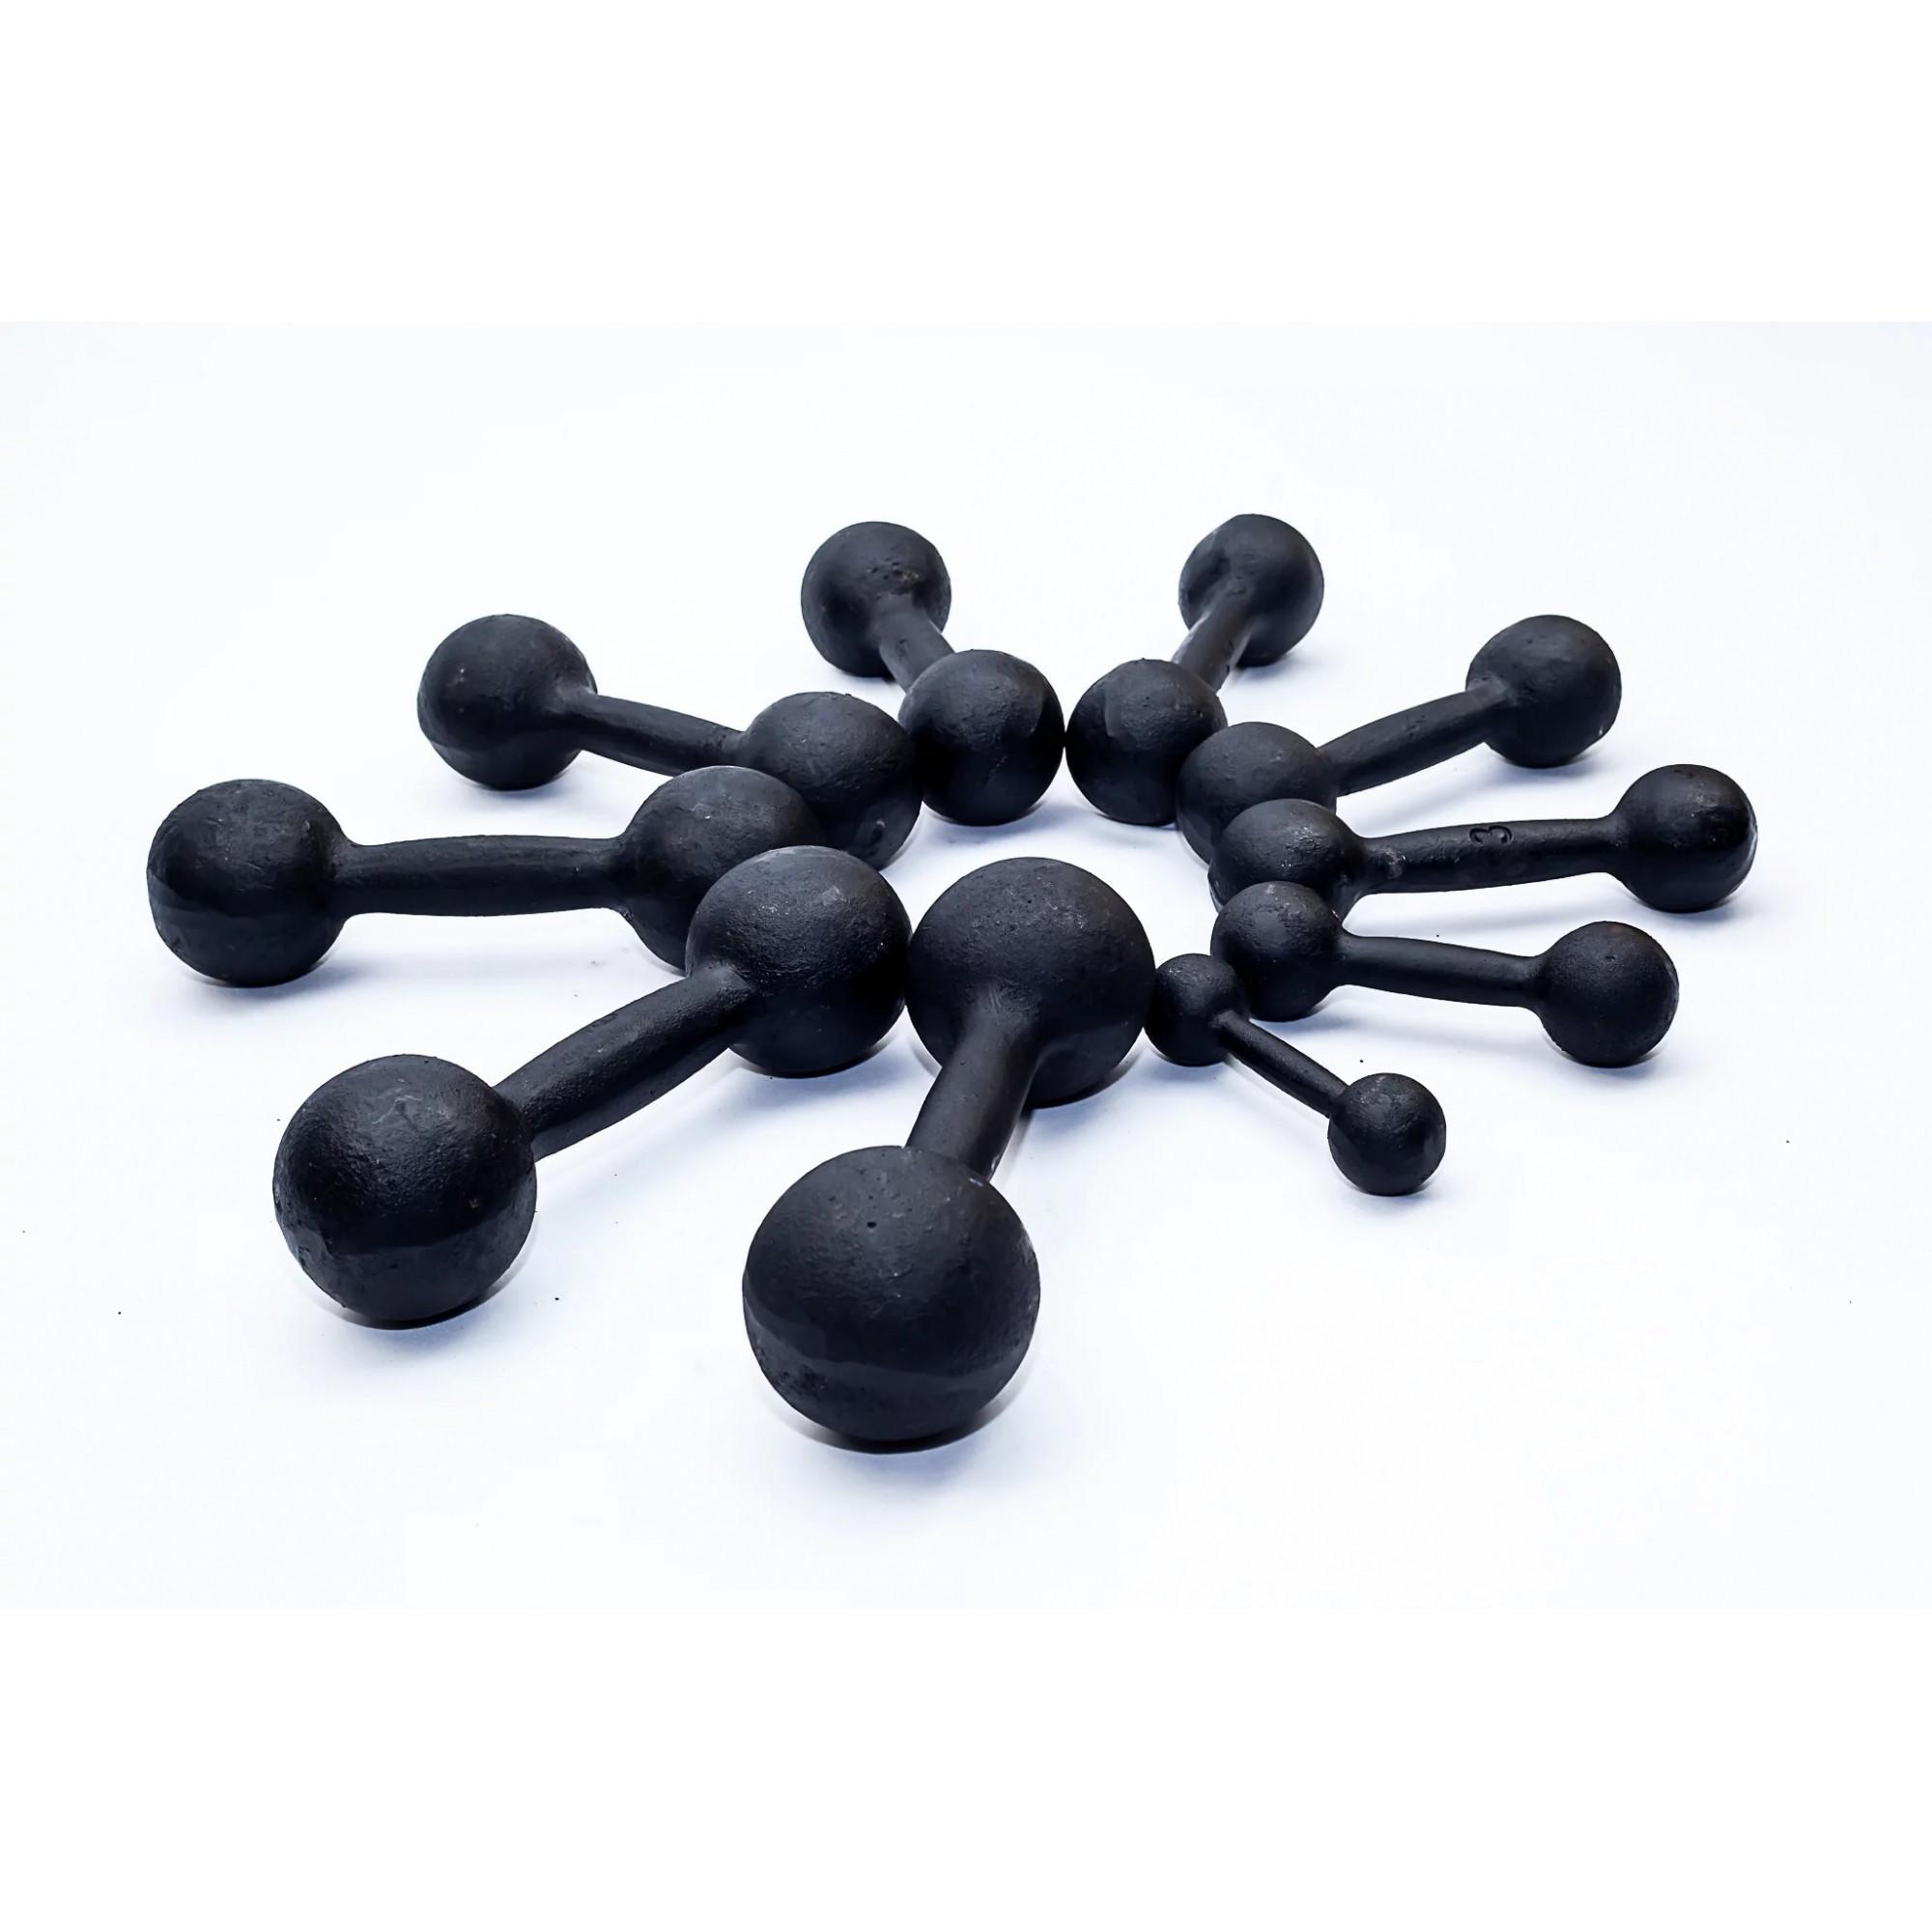 Kit Halteres de Ferro Fundido Pintado - Pares de 1 a 5 Kg